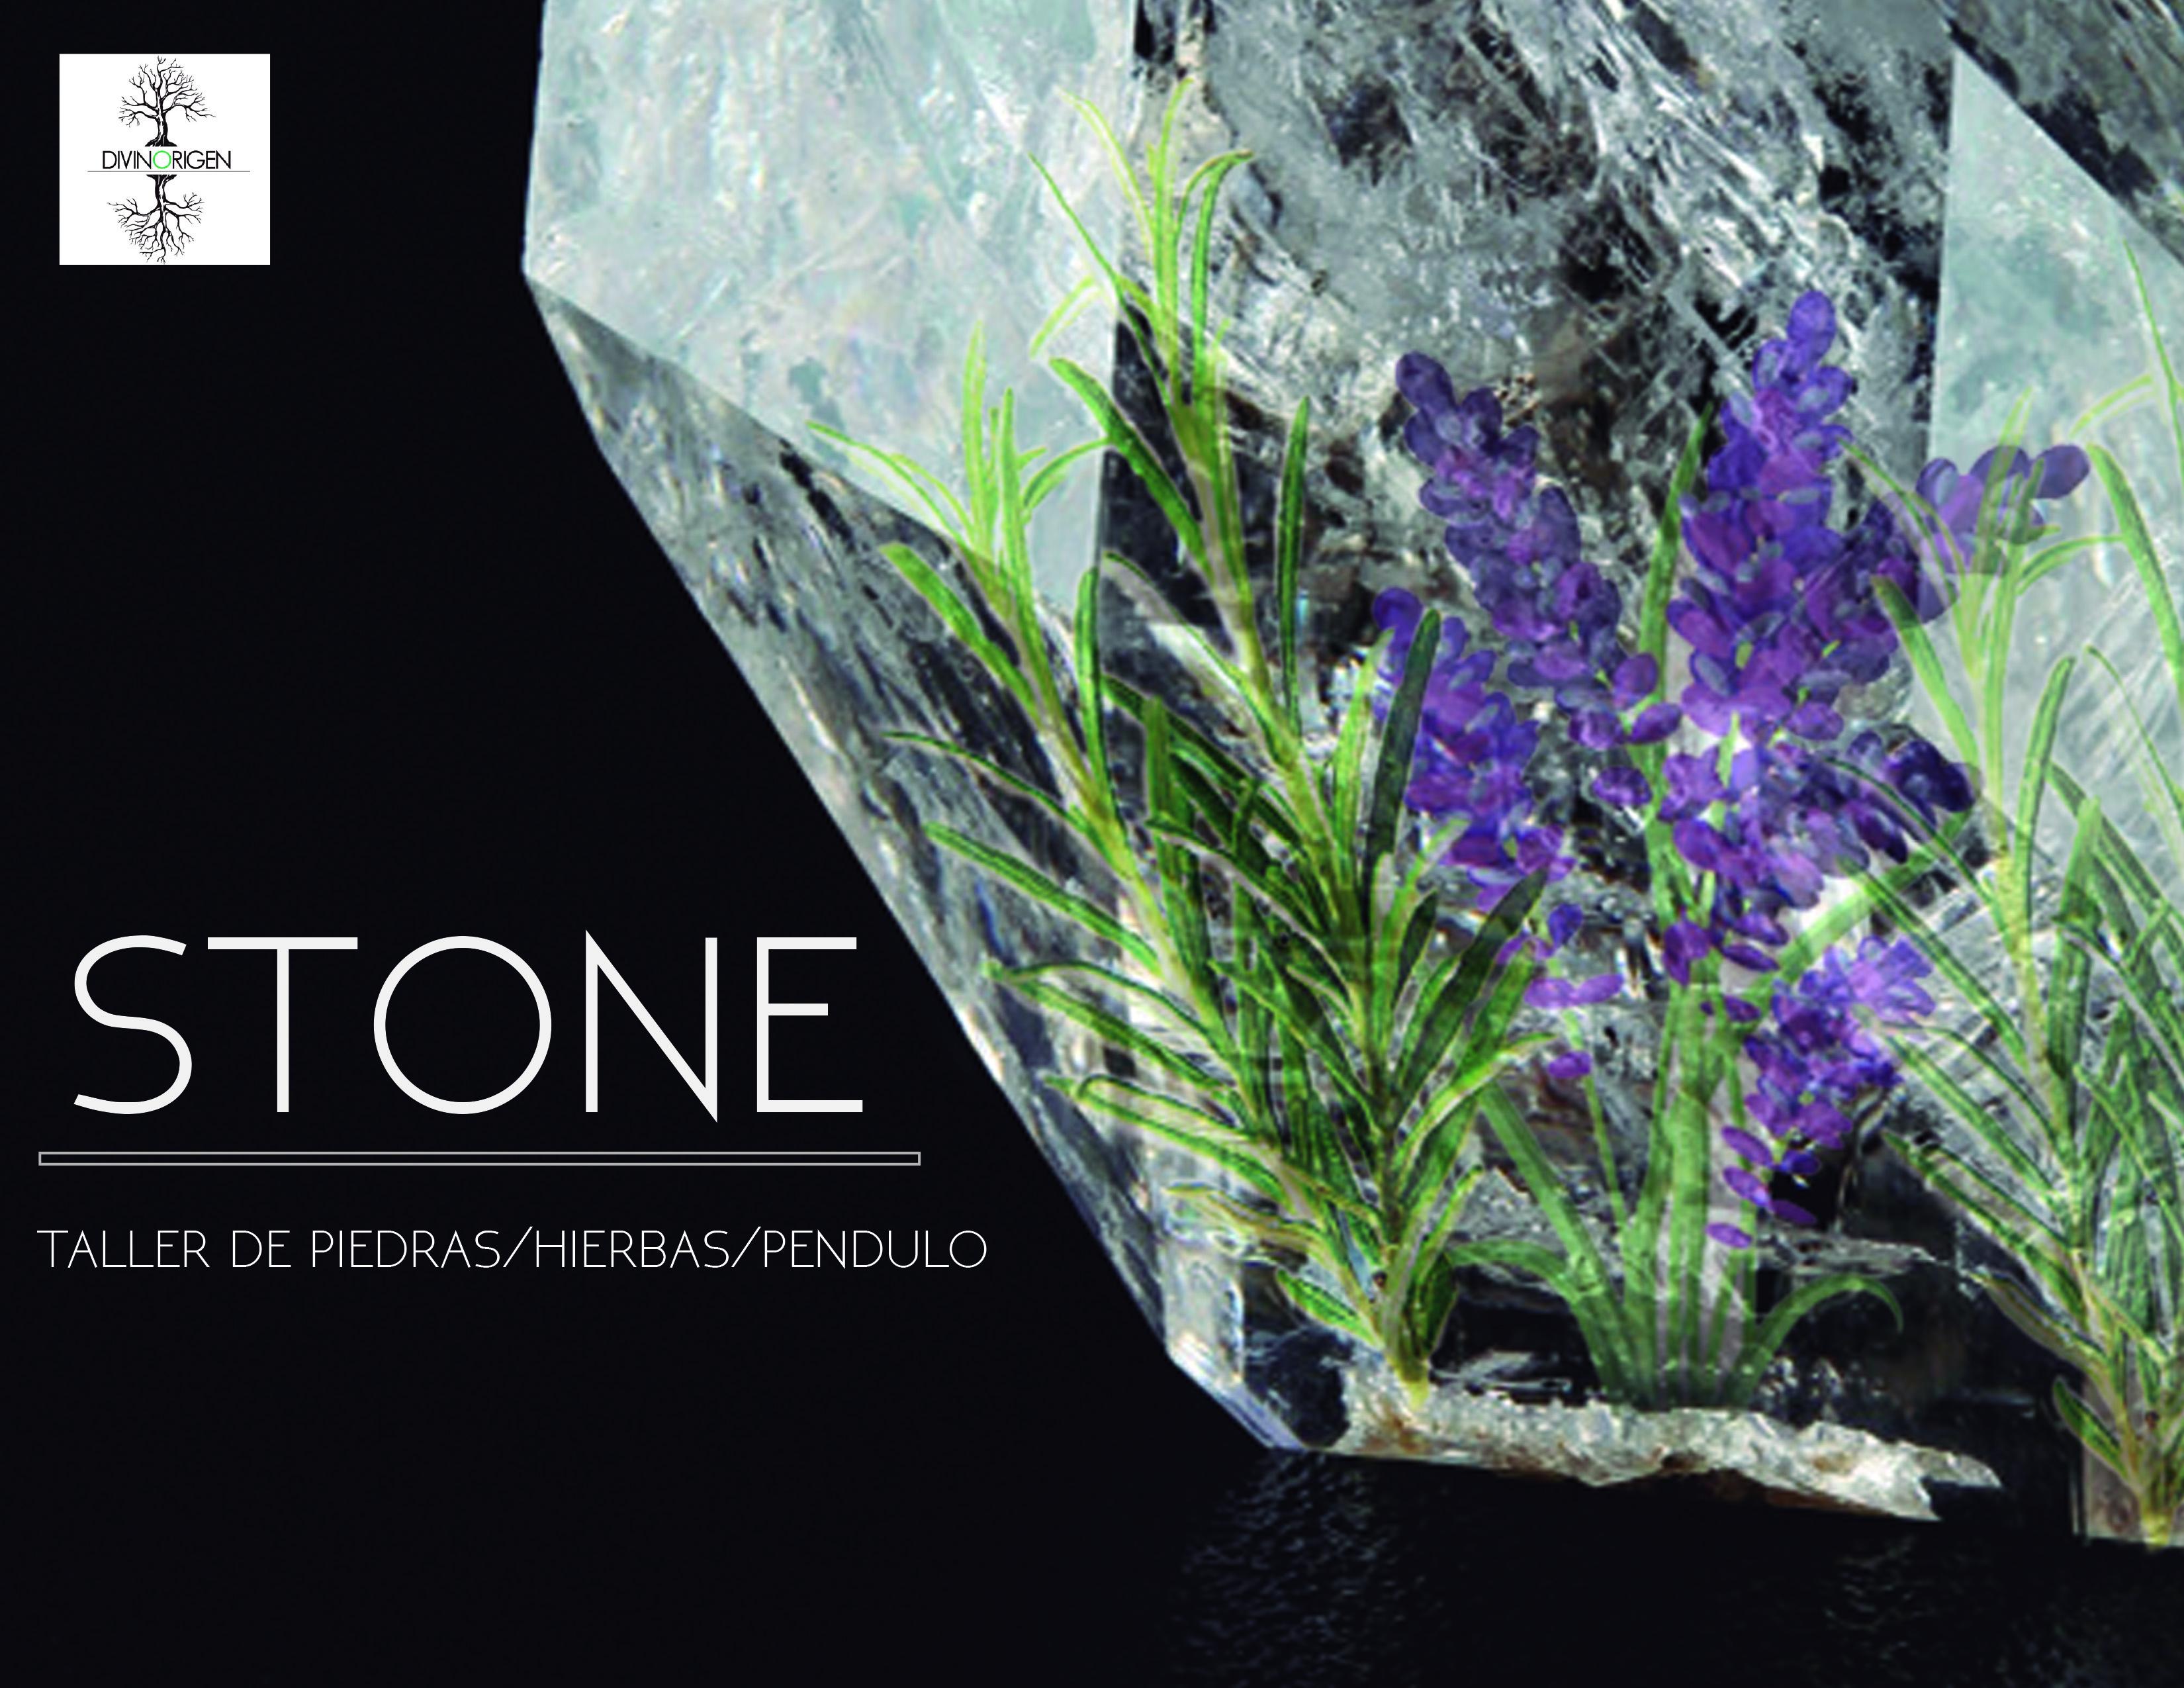 Stone Taller de piedras/ hierbas / péndulo